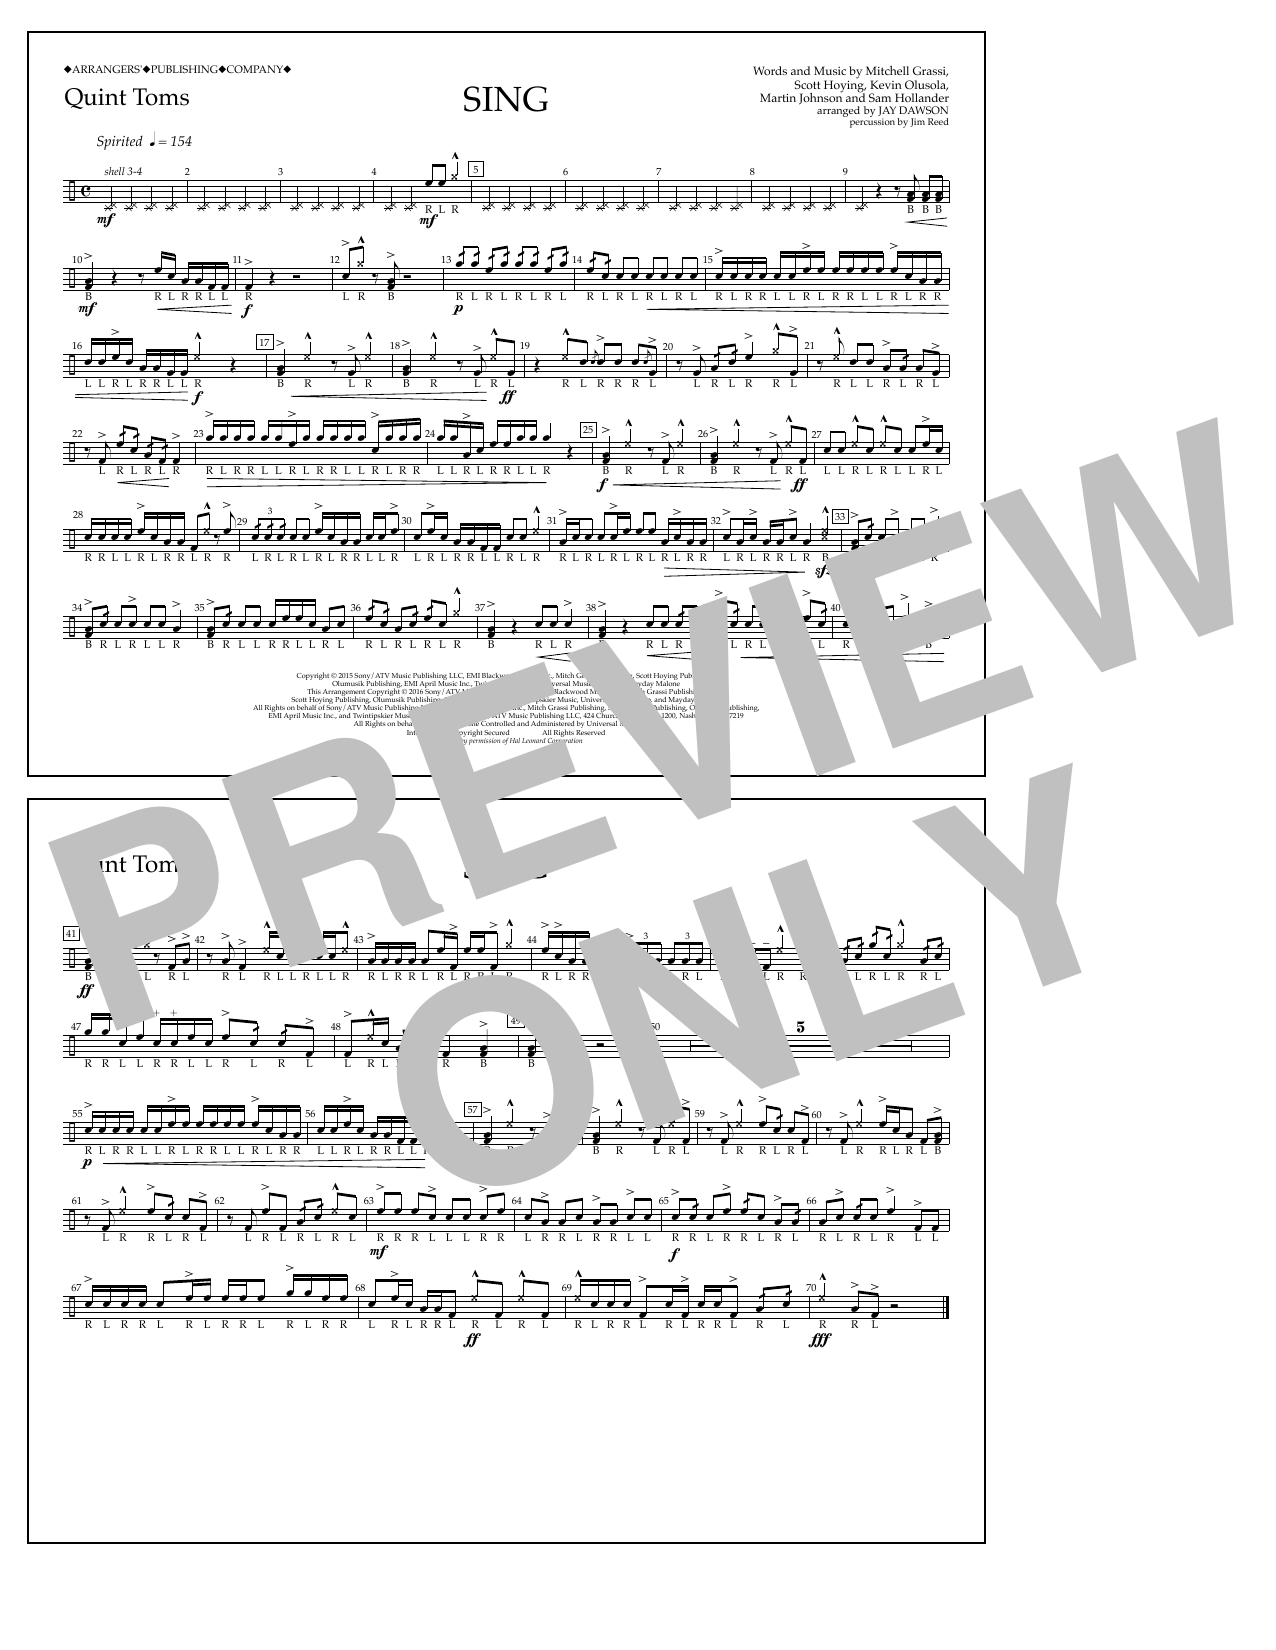 Pentatonix - Sing - Quint-Toms